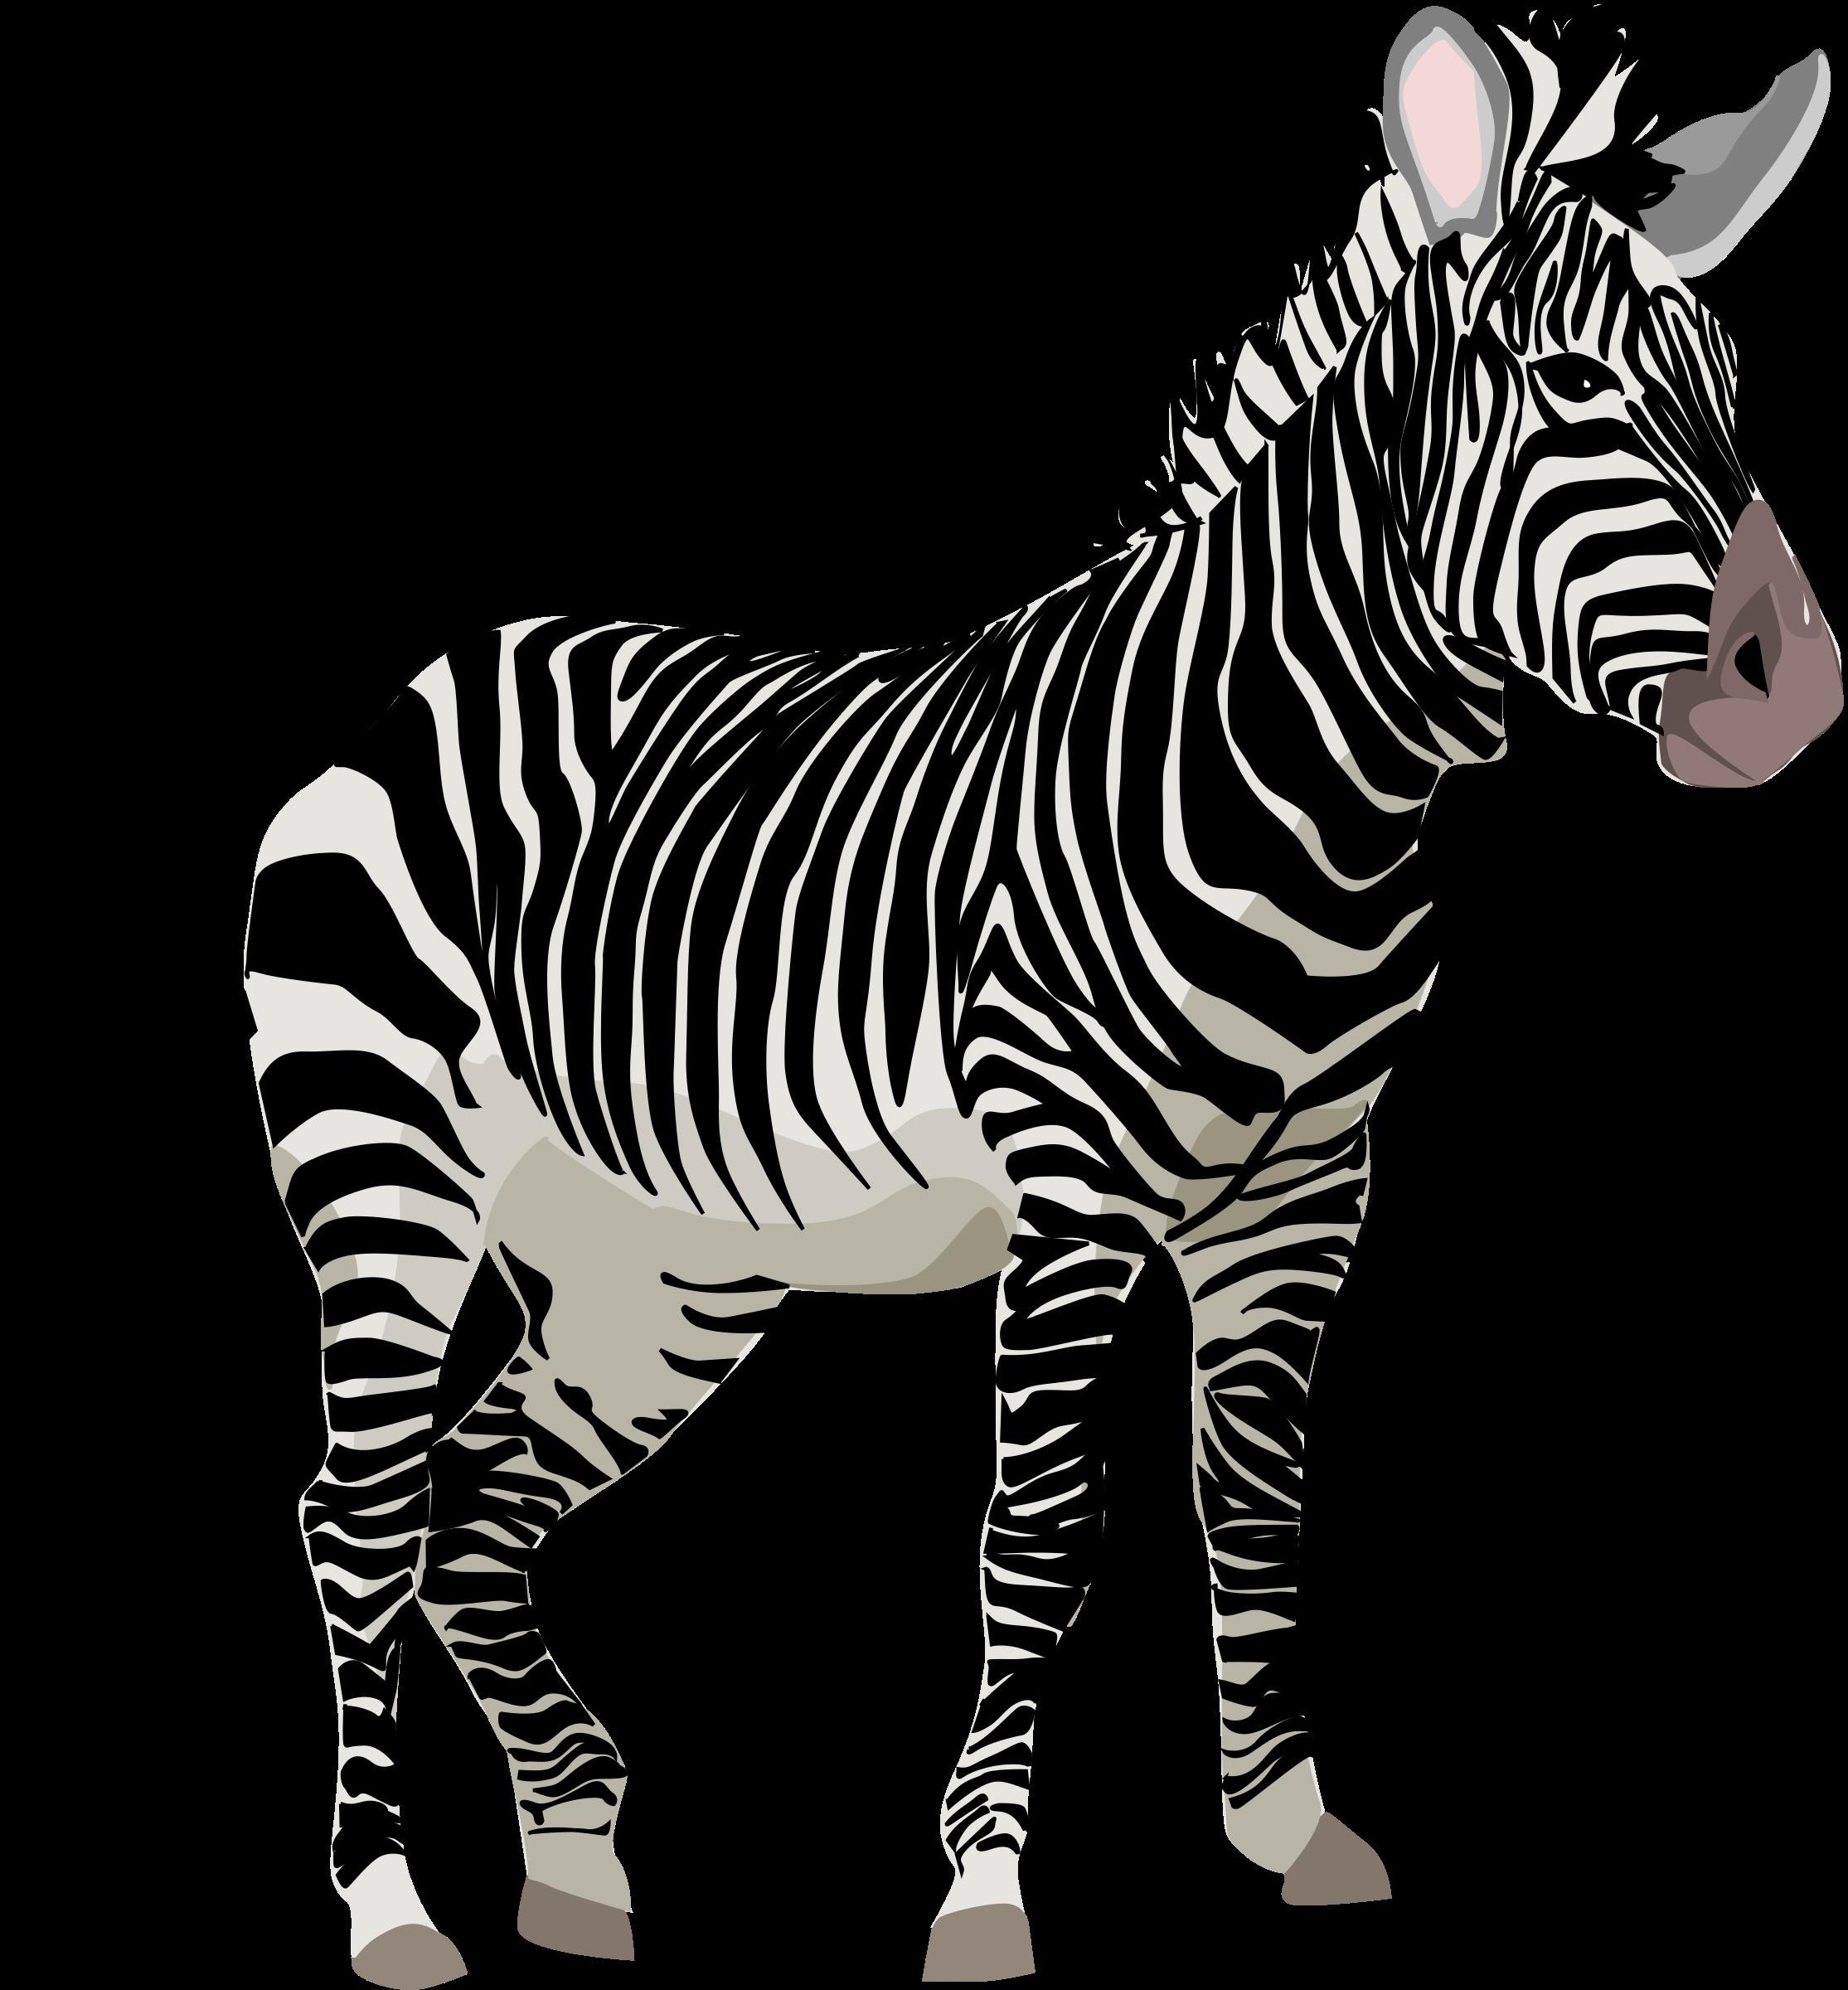 Cebra big image png. Clipart zebra pdf